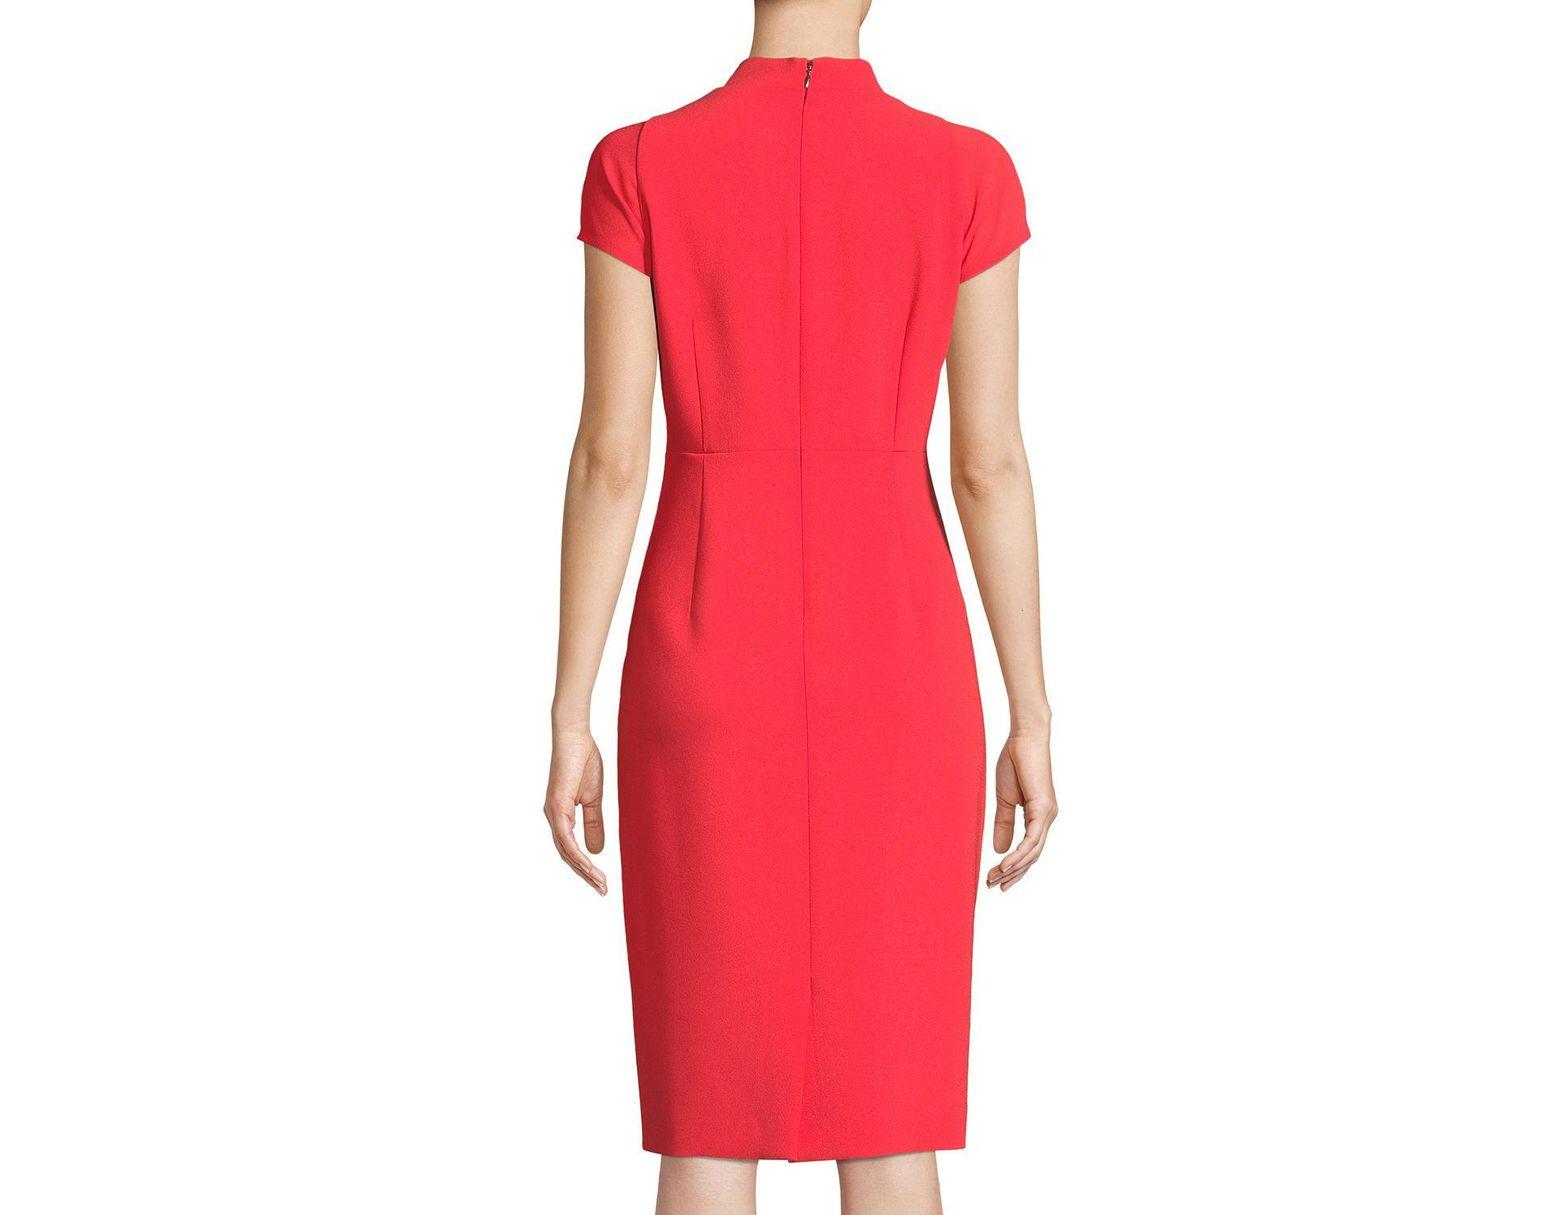 e42dffb7 Elie Tahari Gerarda Stretch-crepe Sheath Dress in Red - Save 65% - Lyst